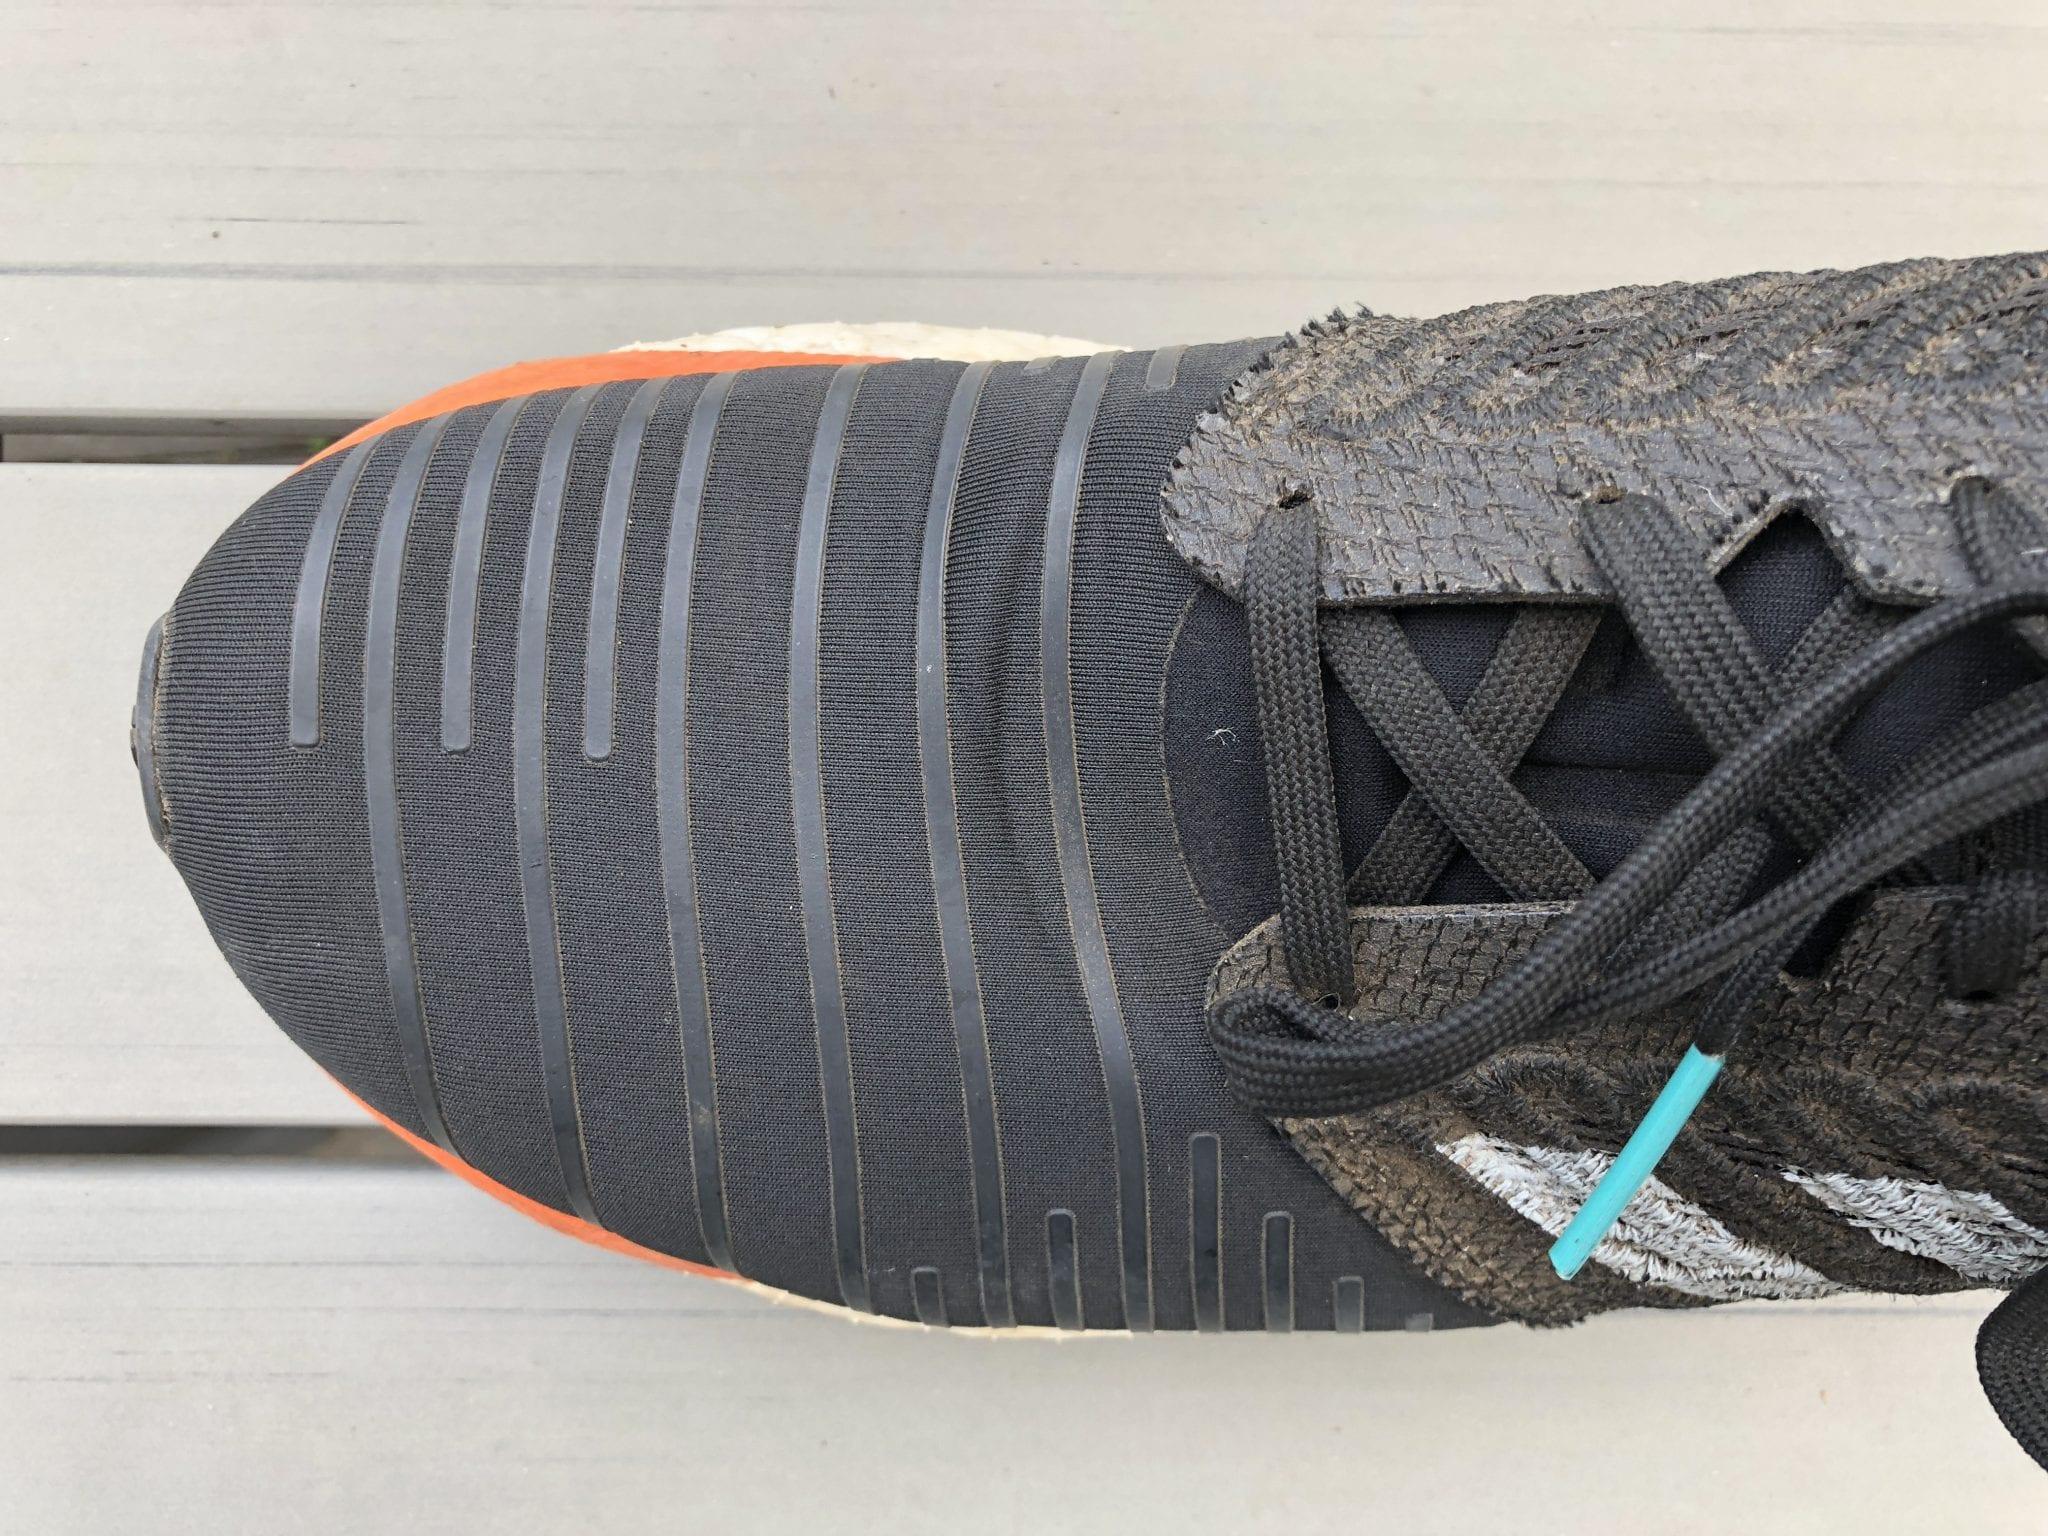 Adidas SolarBOOST 11